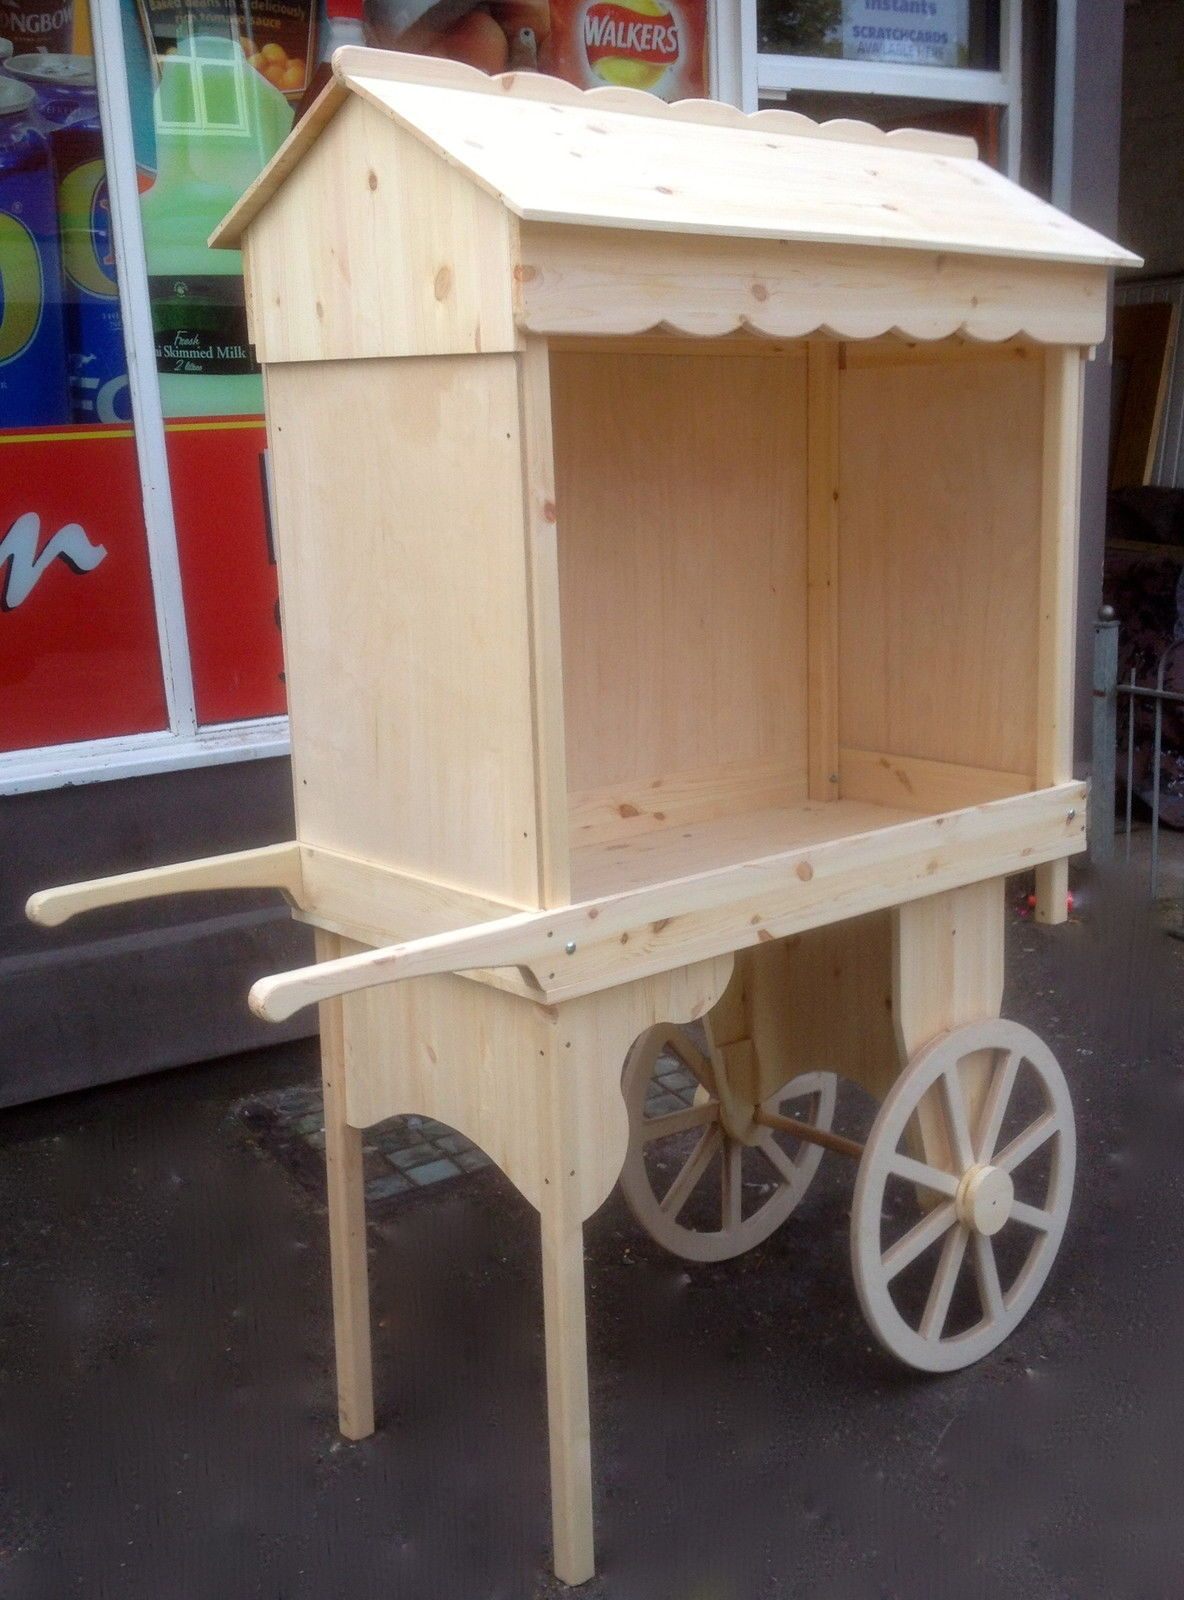 Retail S Barrow Stall Market Garden Wedding Candy Cart Display Counter